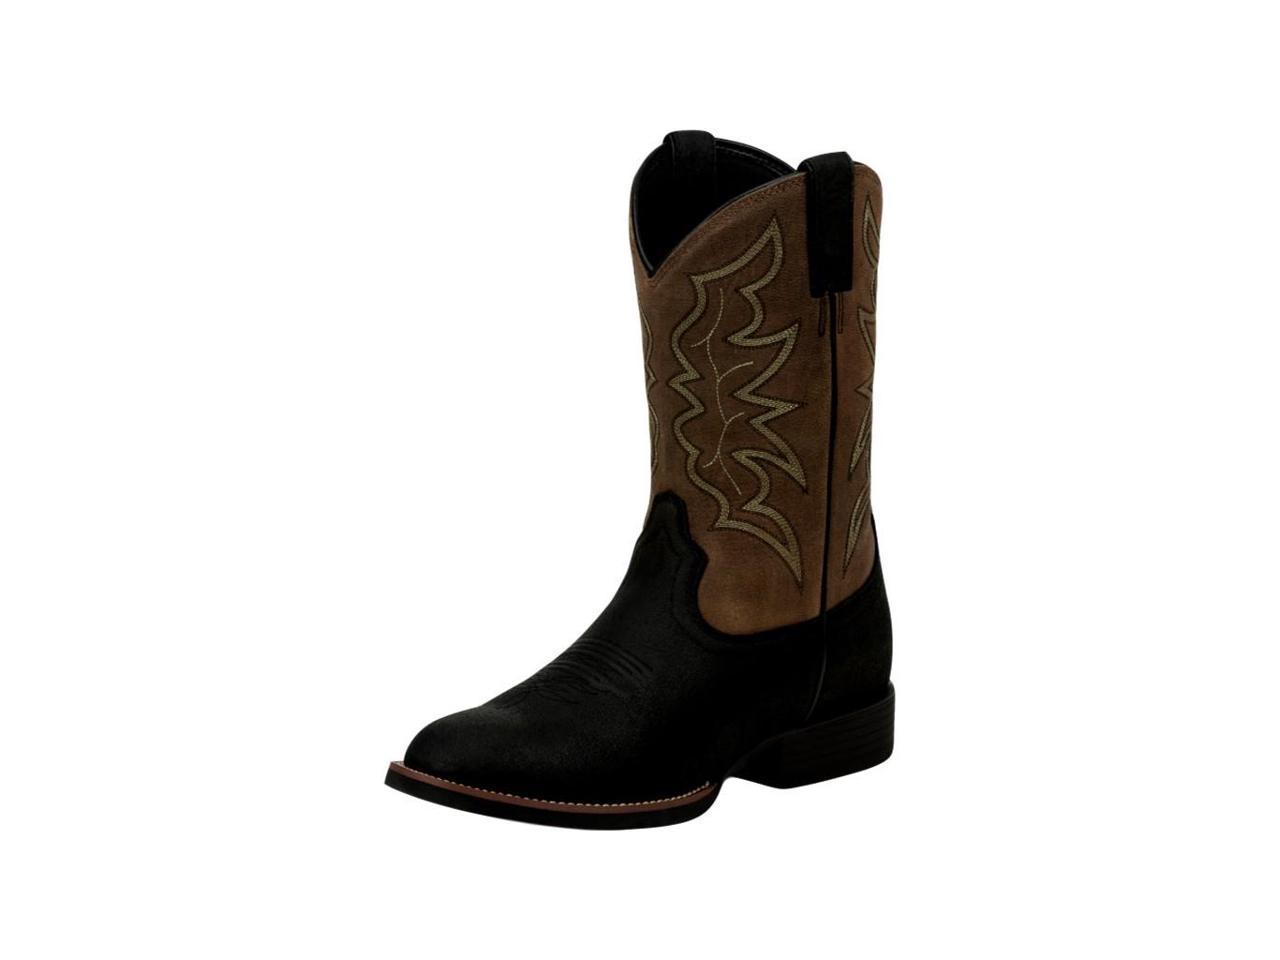 Justin Western Boots Mens Black Stampede Buster 9 EE Black Mens Tan 7220 27bb53